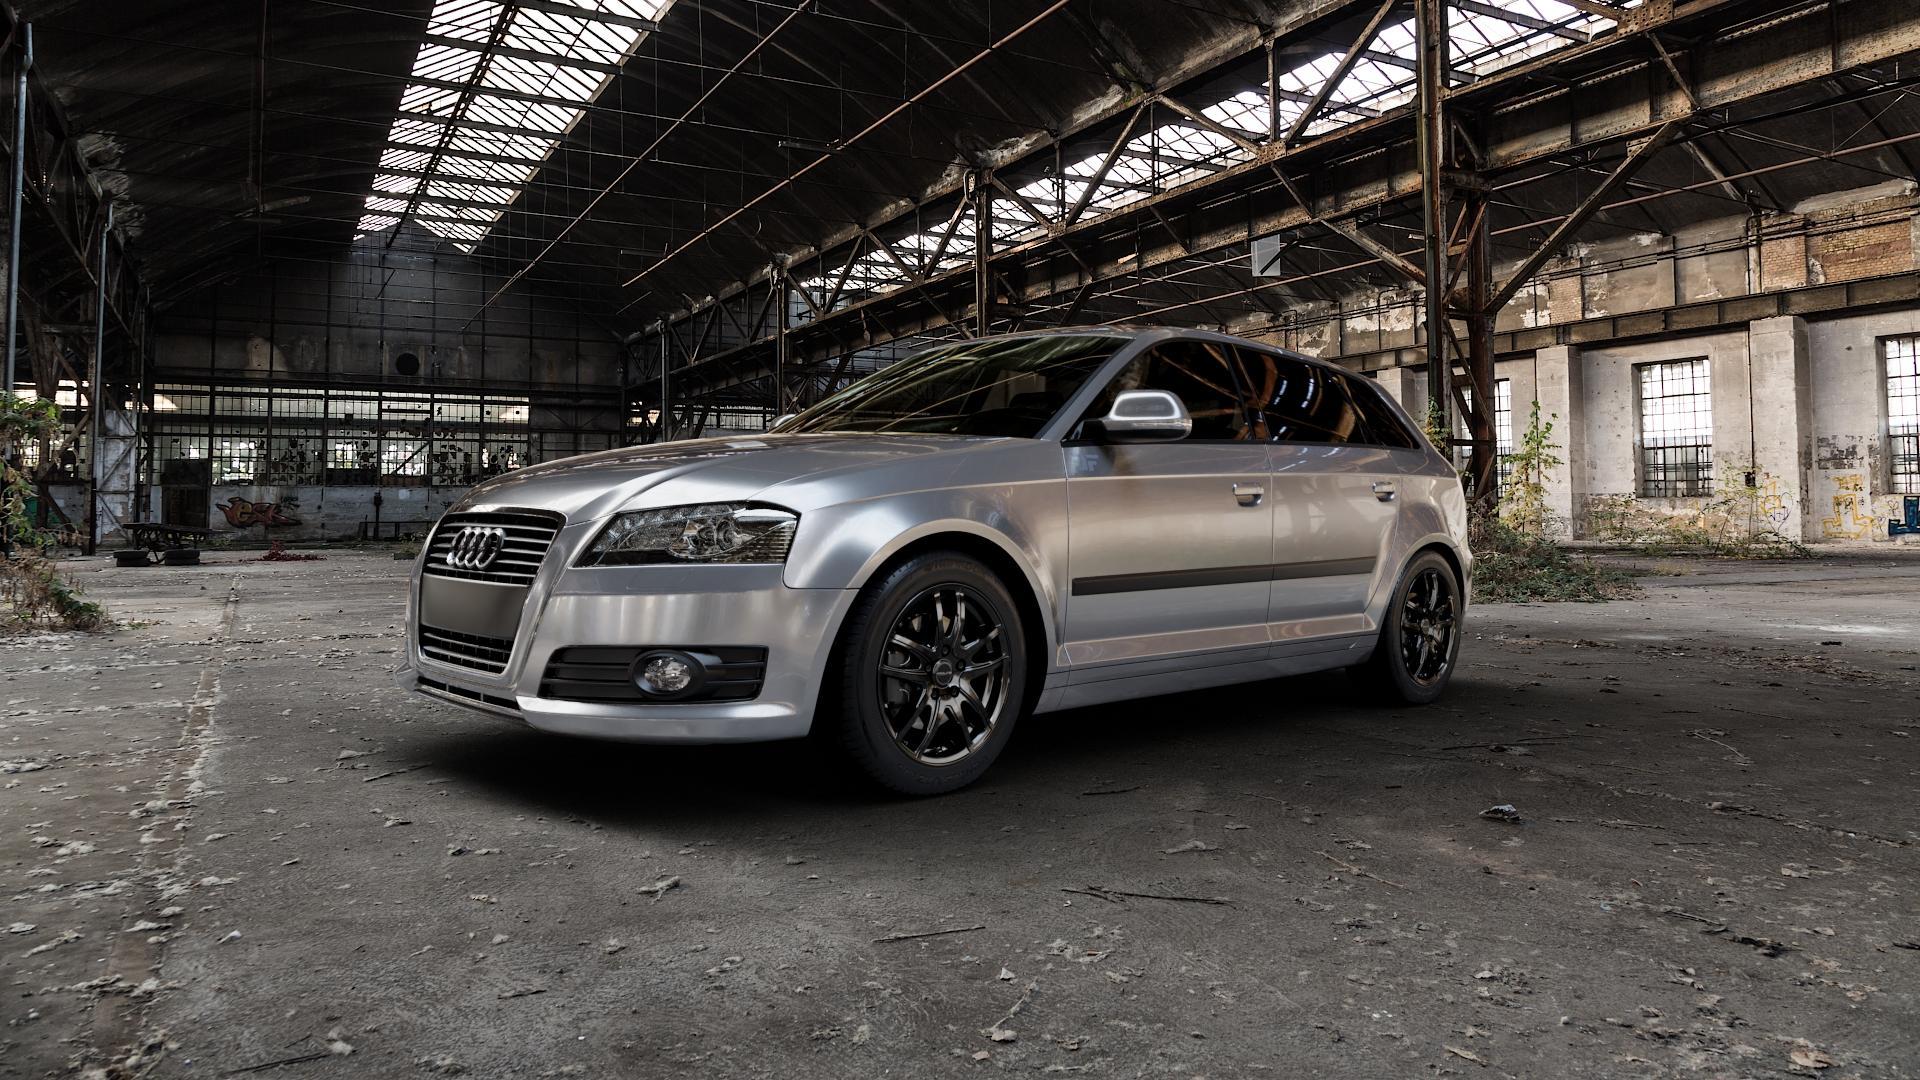 ProLine Wheels VX100 Black Matt Felge mit Reifen schwarz in 16Zoll Winterfelge Alufelge auf silbernem Audi A3 Typ 8P (Sportback) 1,6l 75kW (102 PS) 2,0l FSI 110kW (150 1,9l TDI 77kW (105 103kW (140 TFSI 147kW (200 85kW (116 100kW (136 1,8l 118kW (160 125kW (170 1,4l 92kW (125 120kW (163 quattro 3,2l V6 184kW (250 S3 195kW (265 1,2l 66kW (90